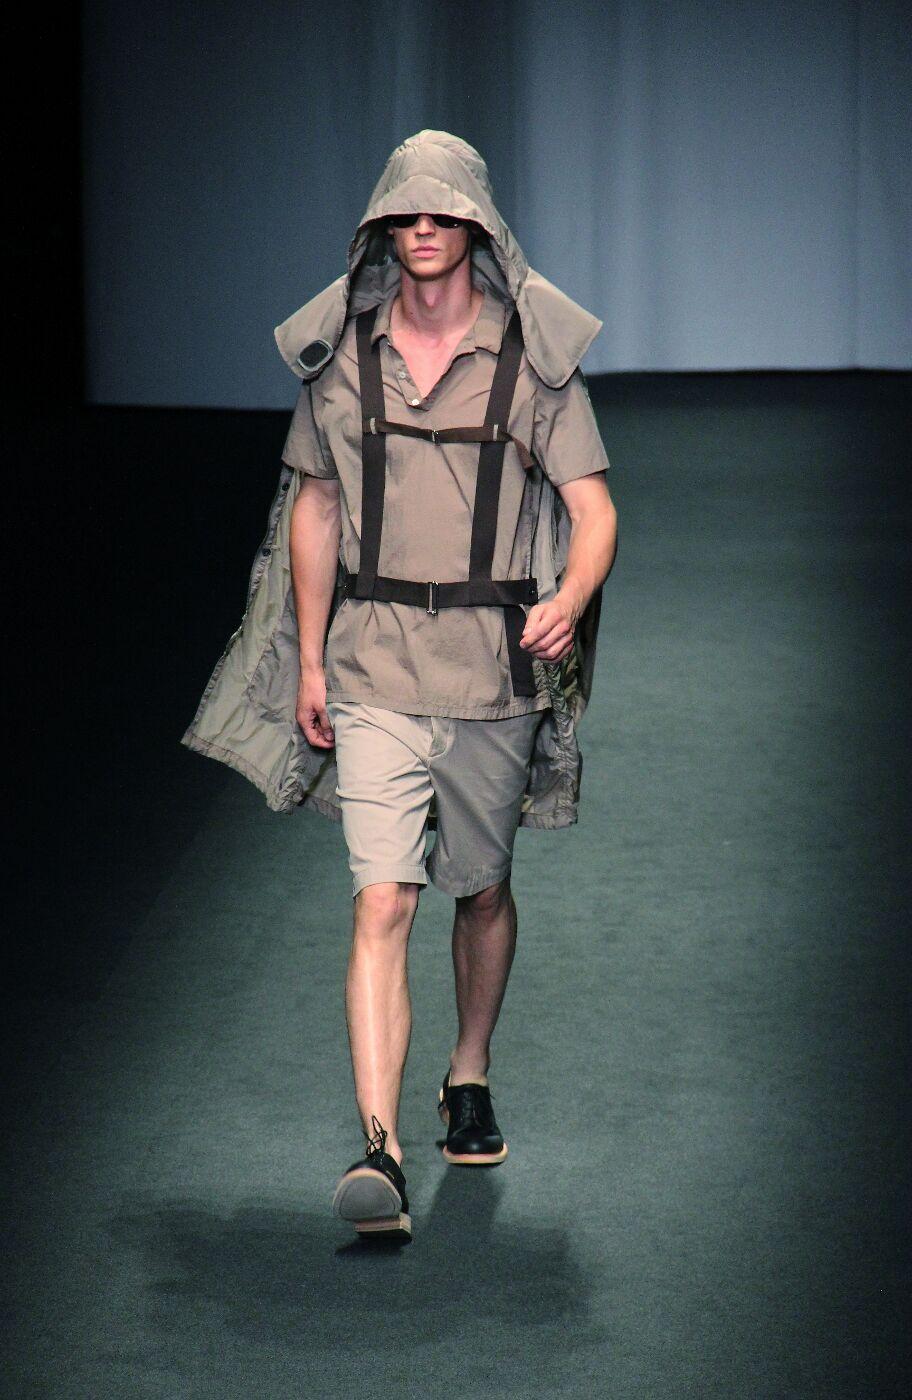 spring-summer-nicole-farhi-2012-men-collection-milano-fashion-week-2012-nicole-farhi-fashion-show-catwalk